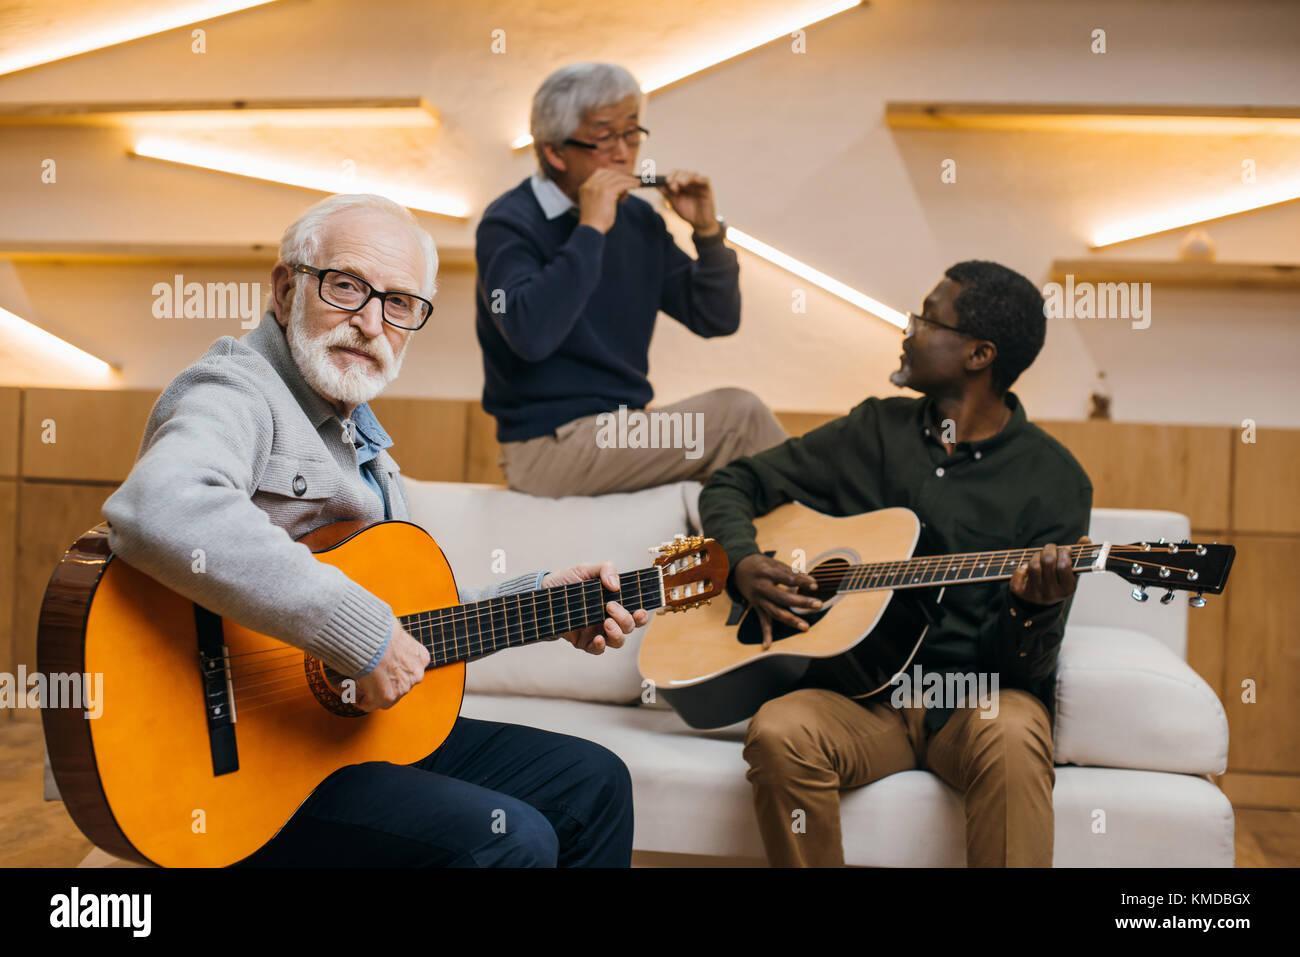 senior friends playing music - Stock Image